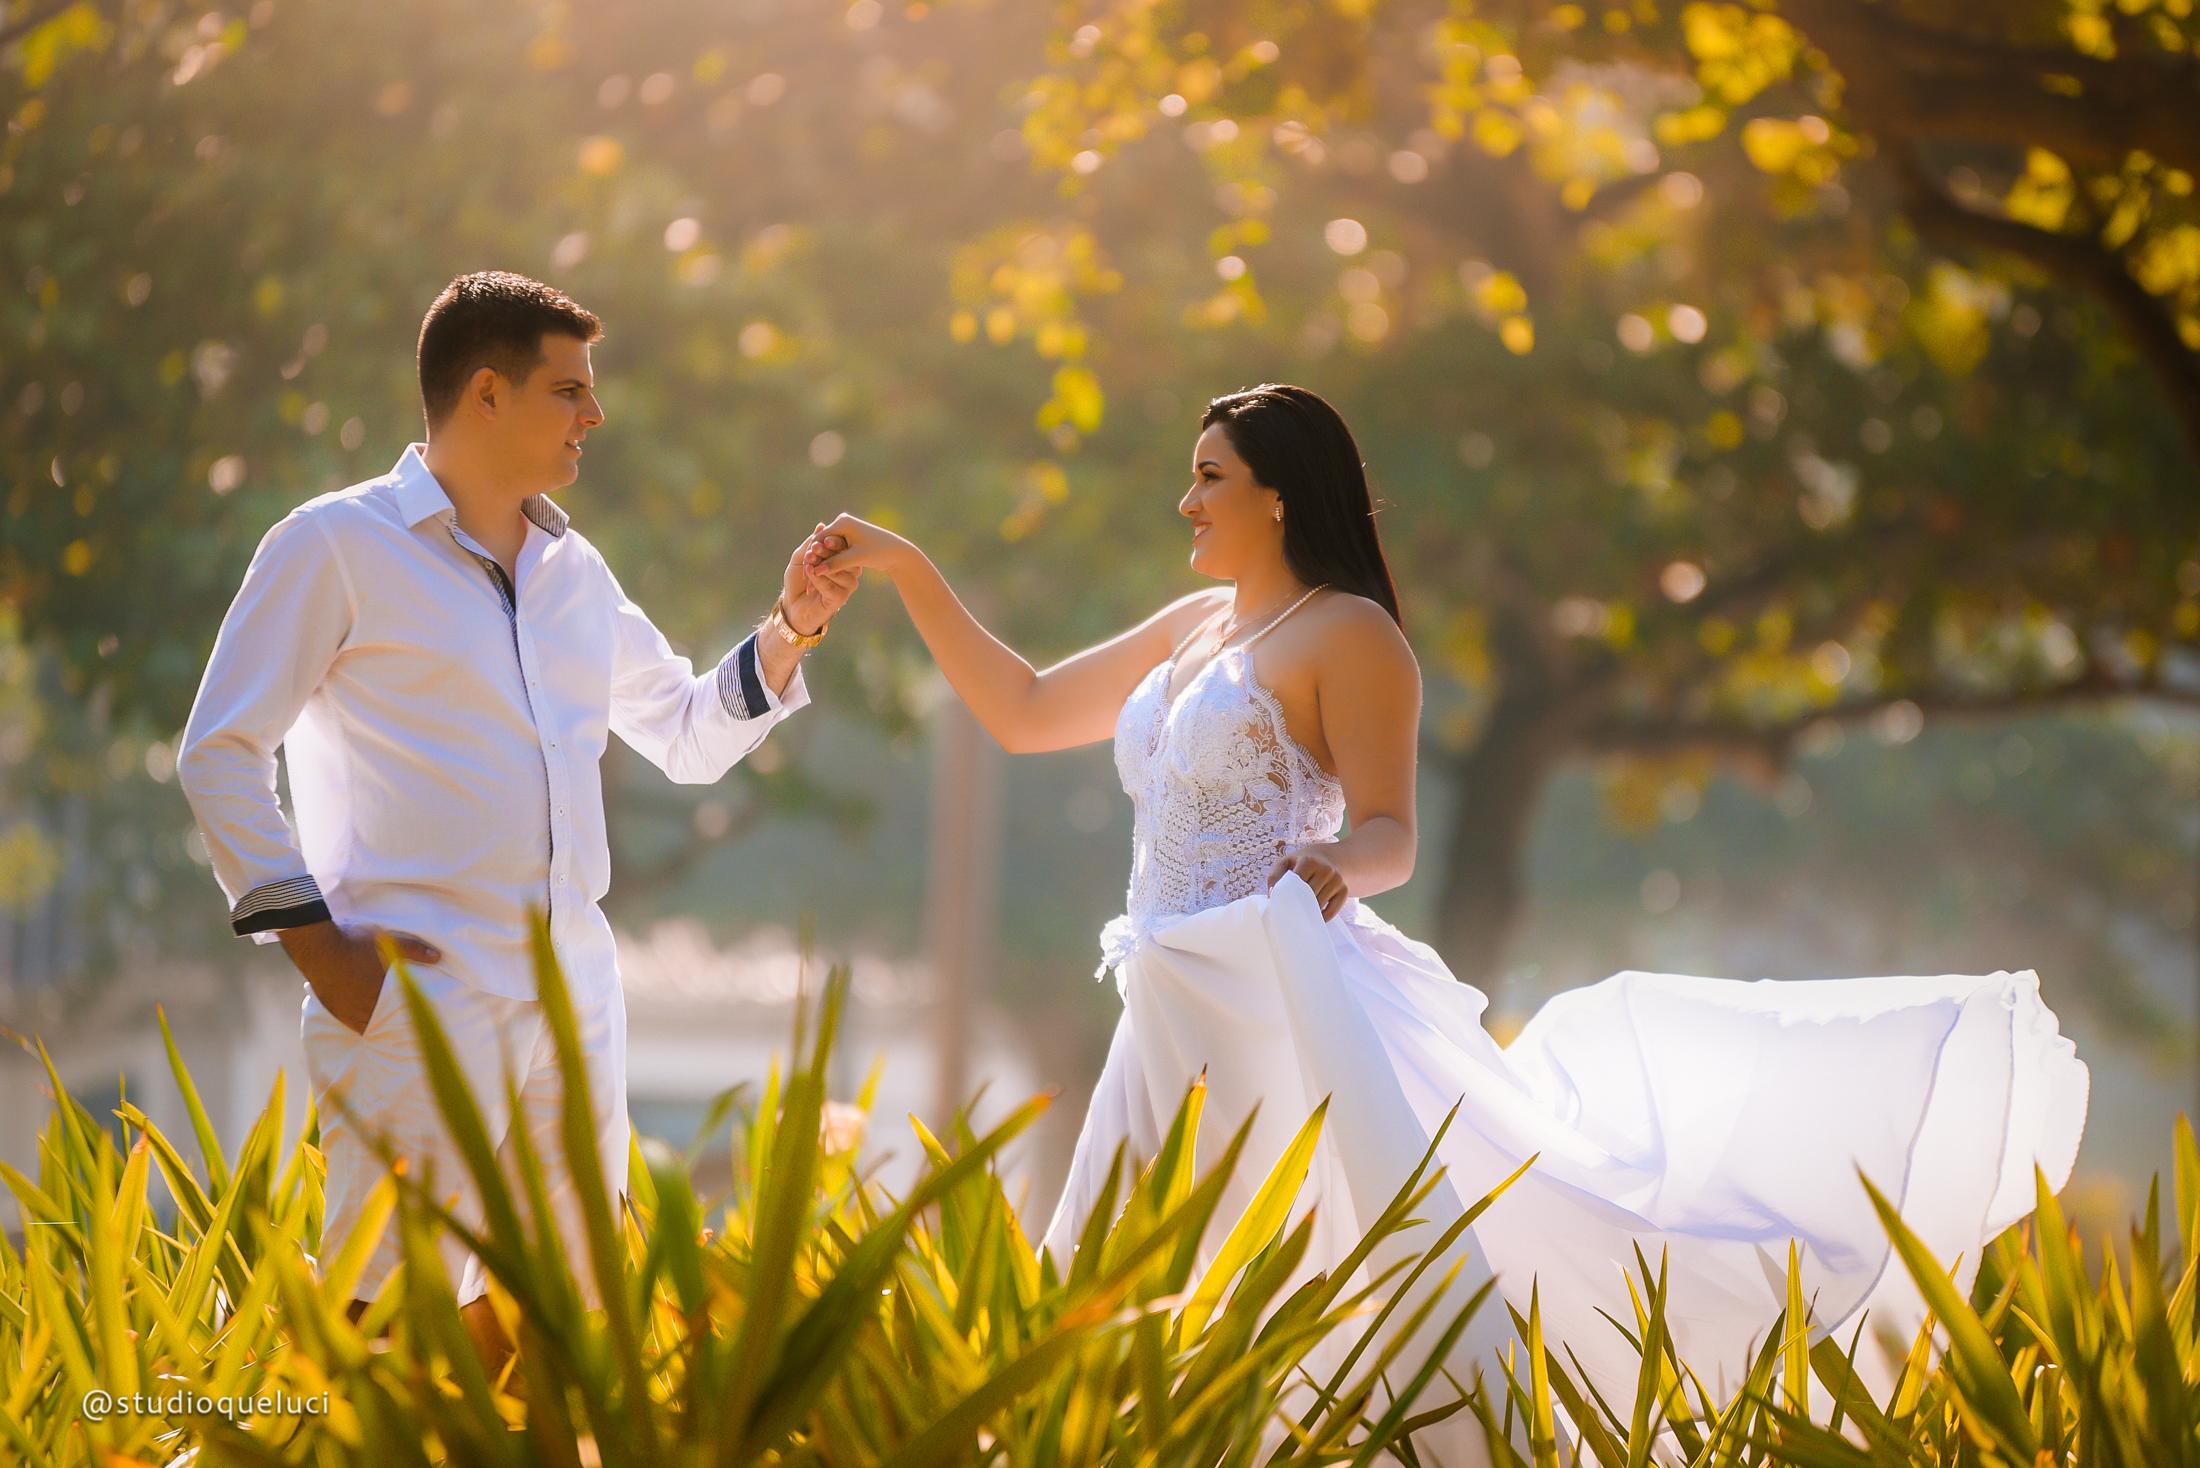 fotografia de casamento ensaio pre wedding (6)